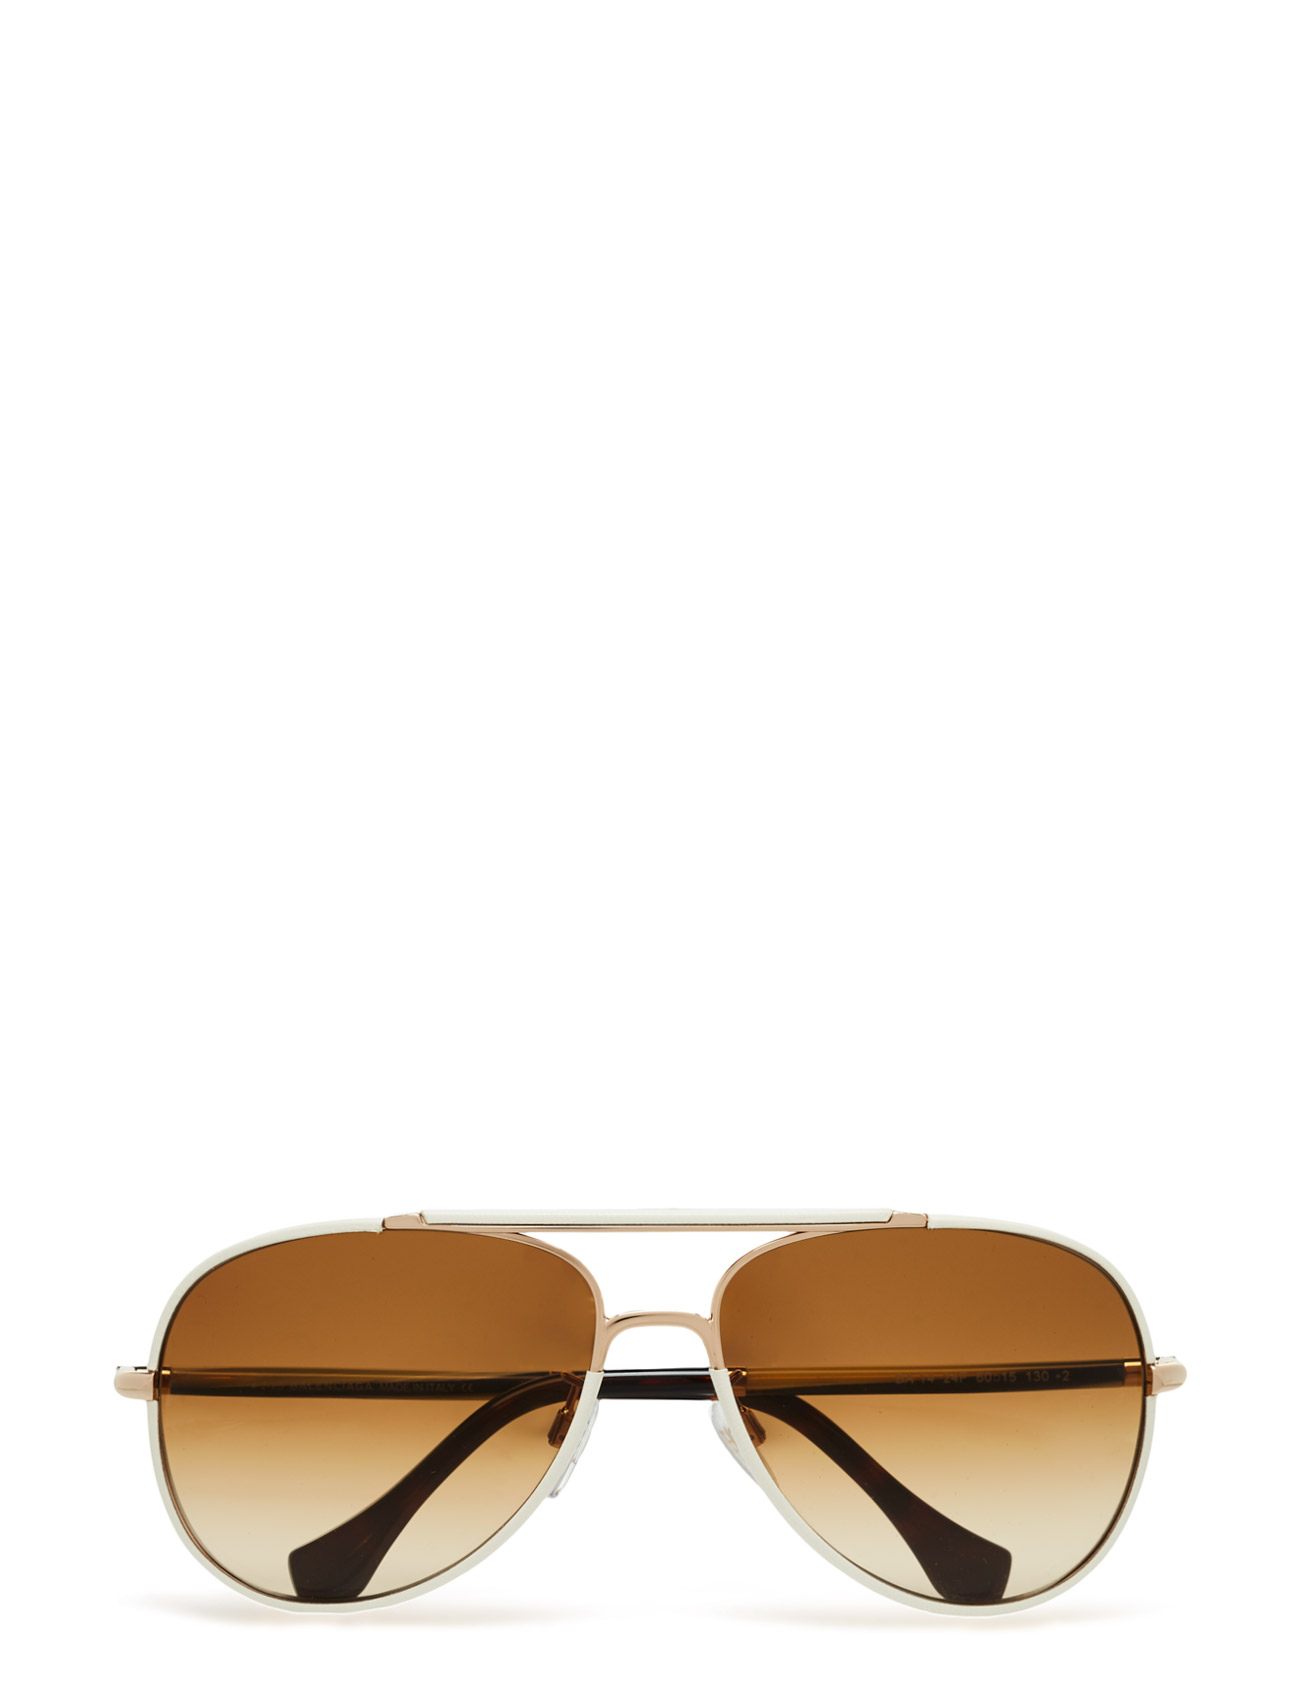 balenciaga sunglasses Ba0014 fra boozt.com dk